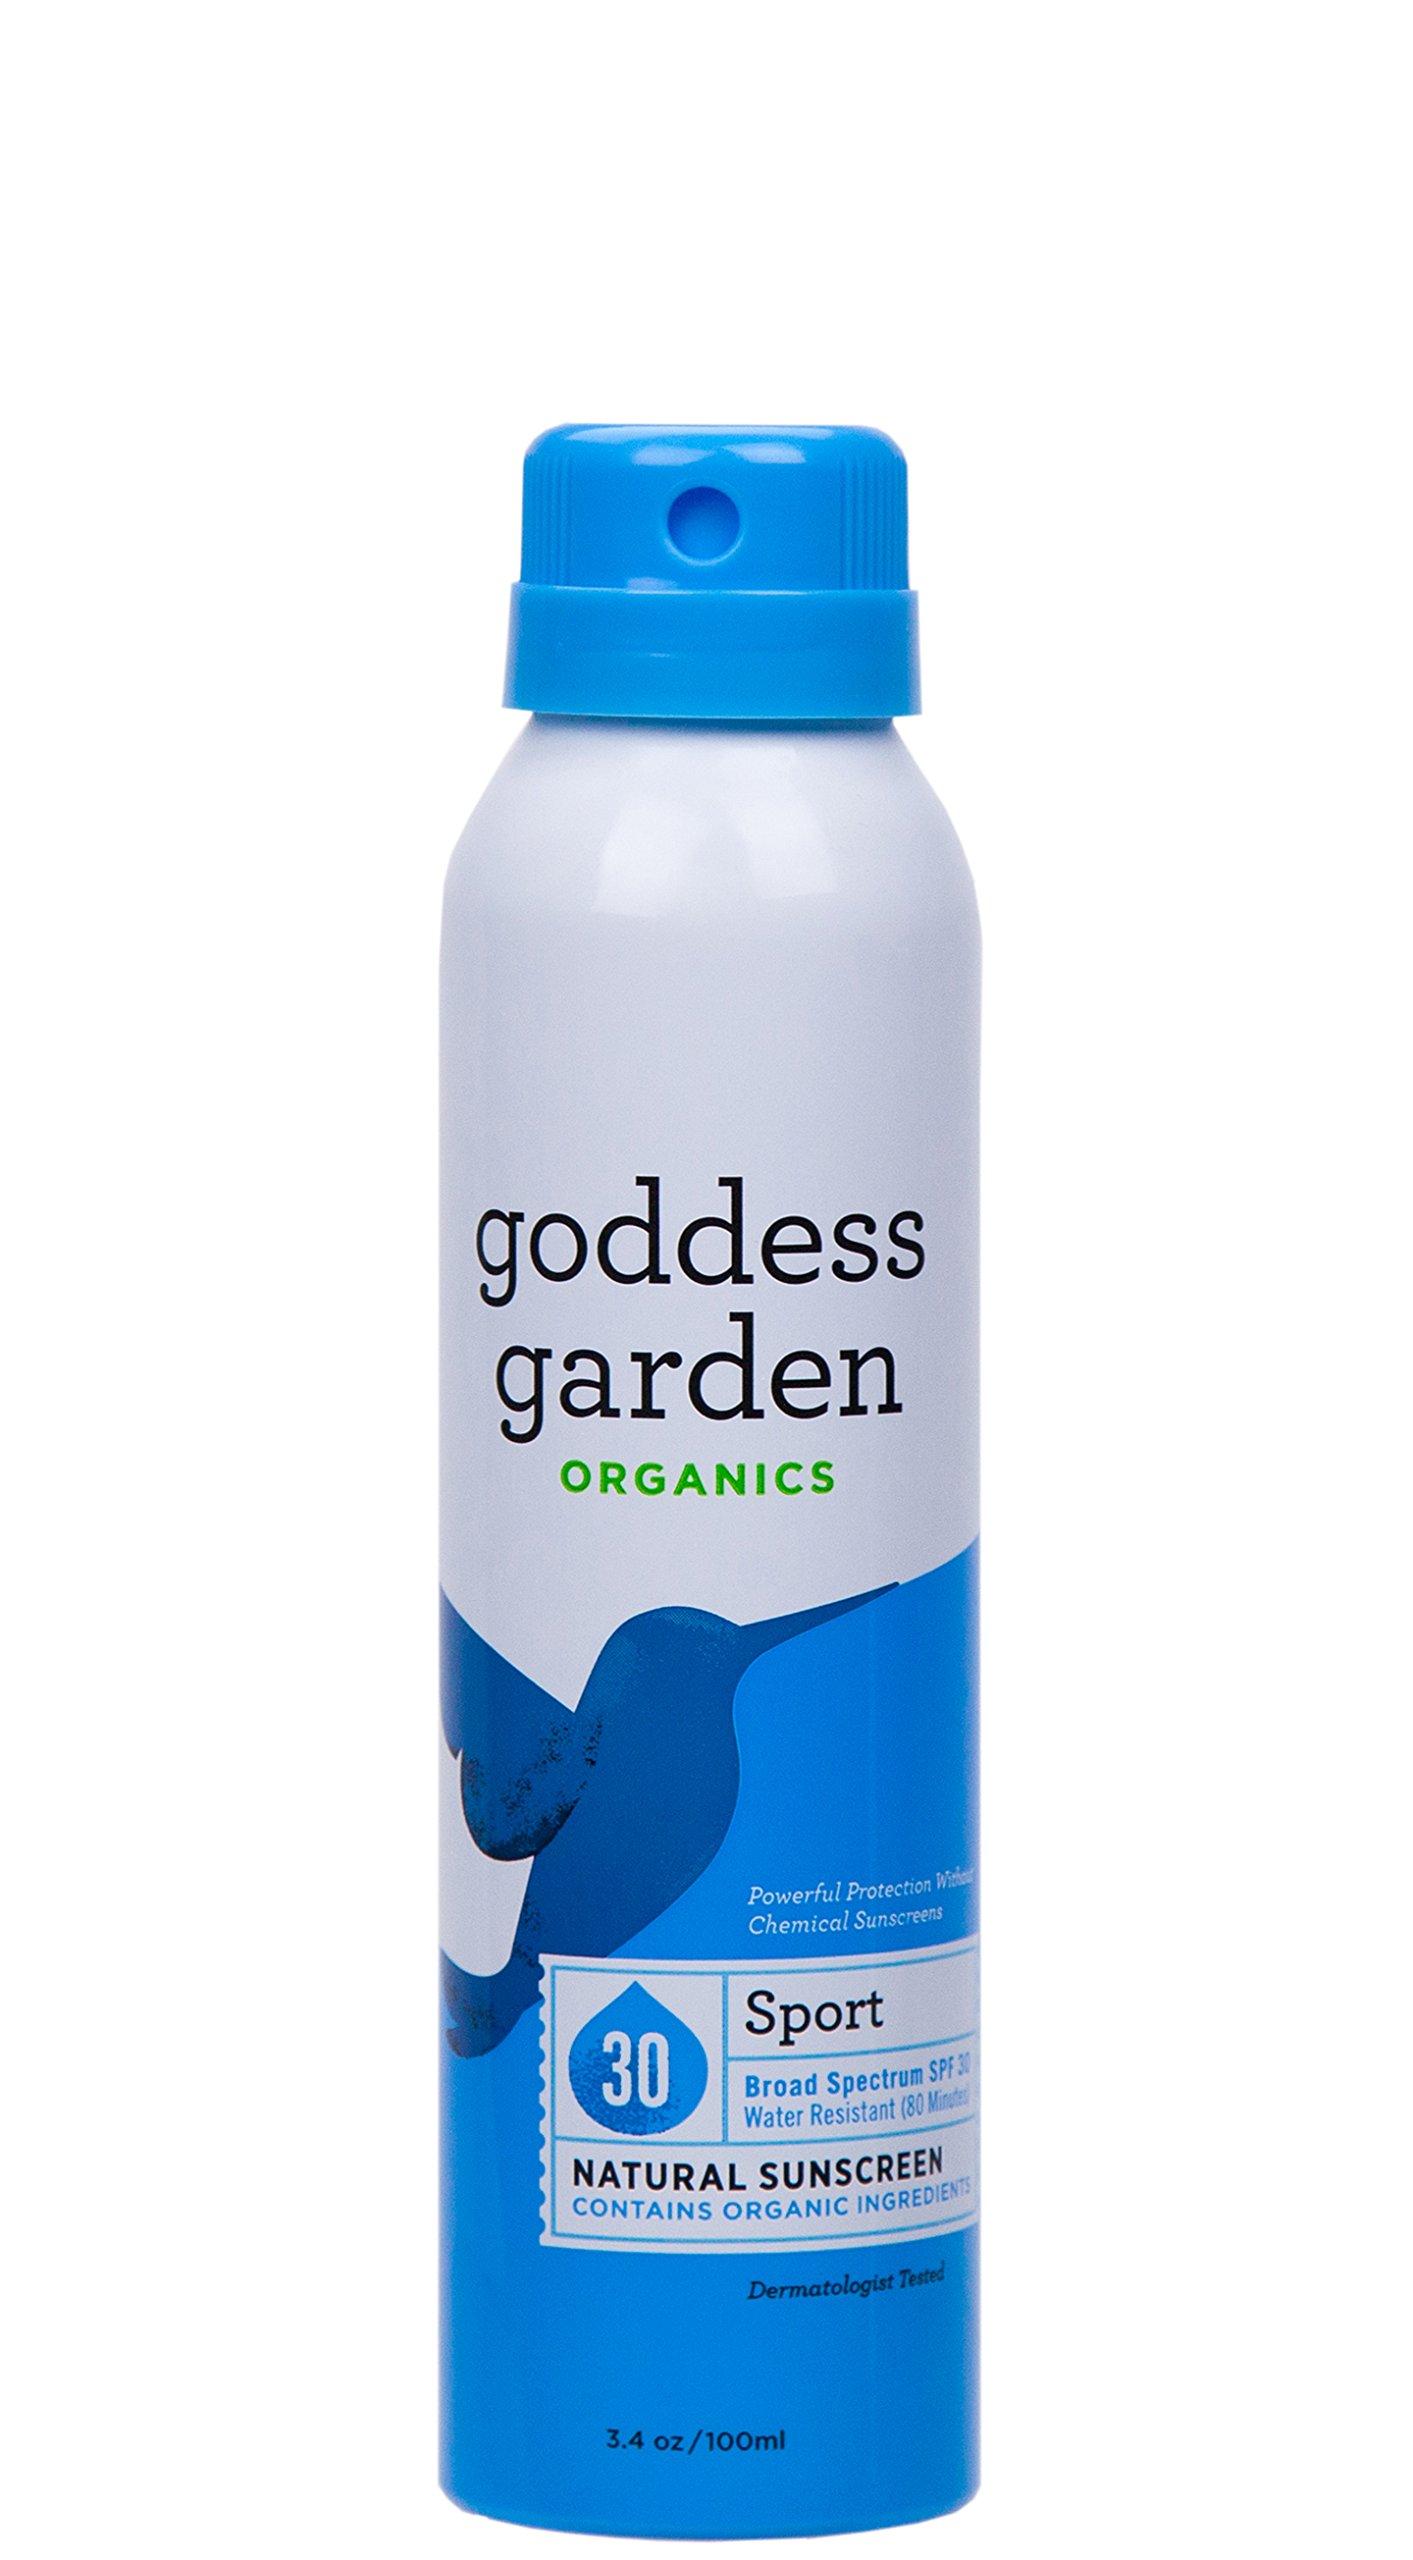 Goddess Garden Organics Natural Mineral Sunscreen - New Formula Available